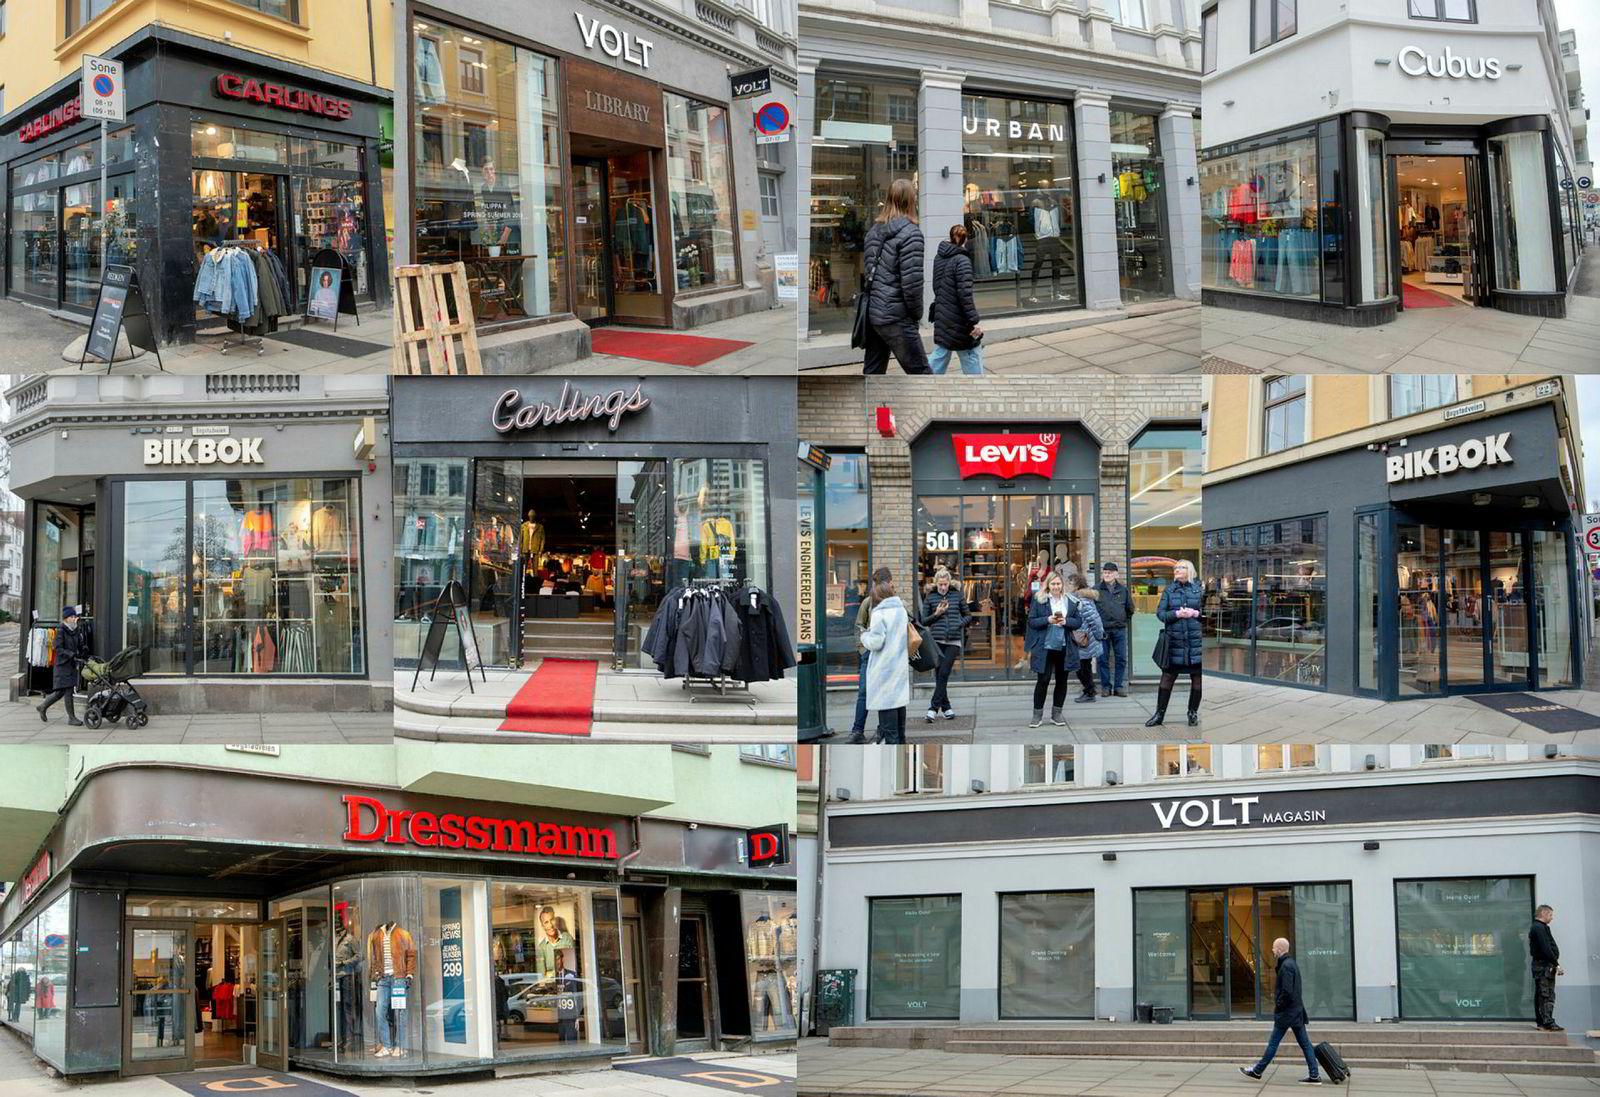 Langs Bogstadveien og Hegdehaugsveien har Varner-gruppen ti butikker fordelt på 800 meter.